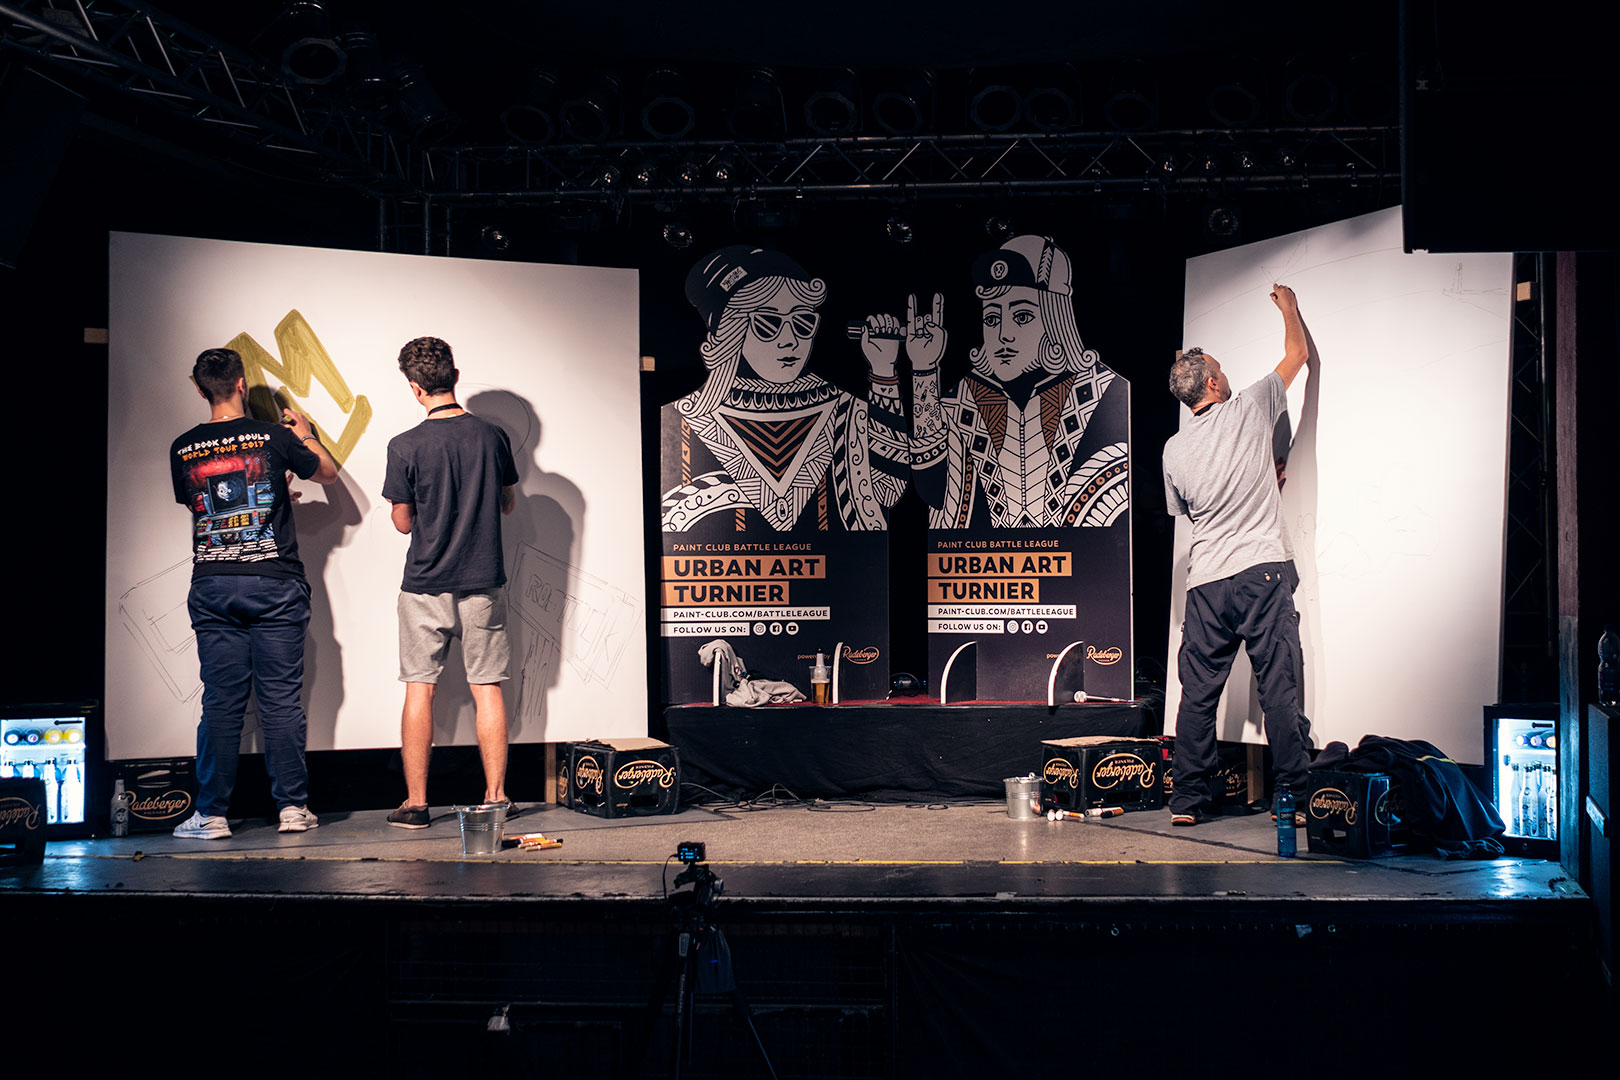 Paint Club Battle League 2018 Urban Art Wettkampf in Rostock